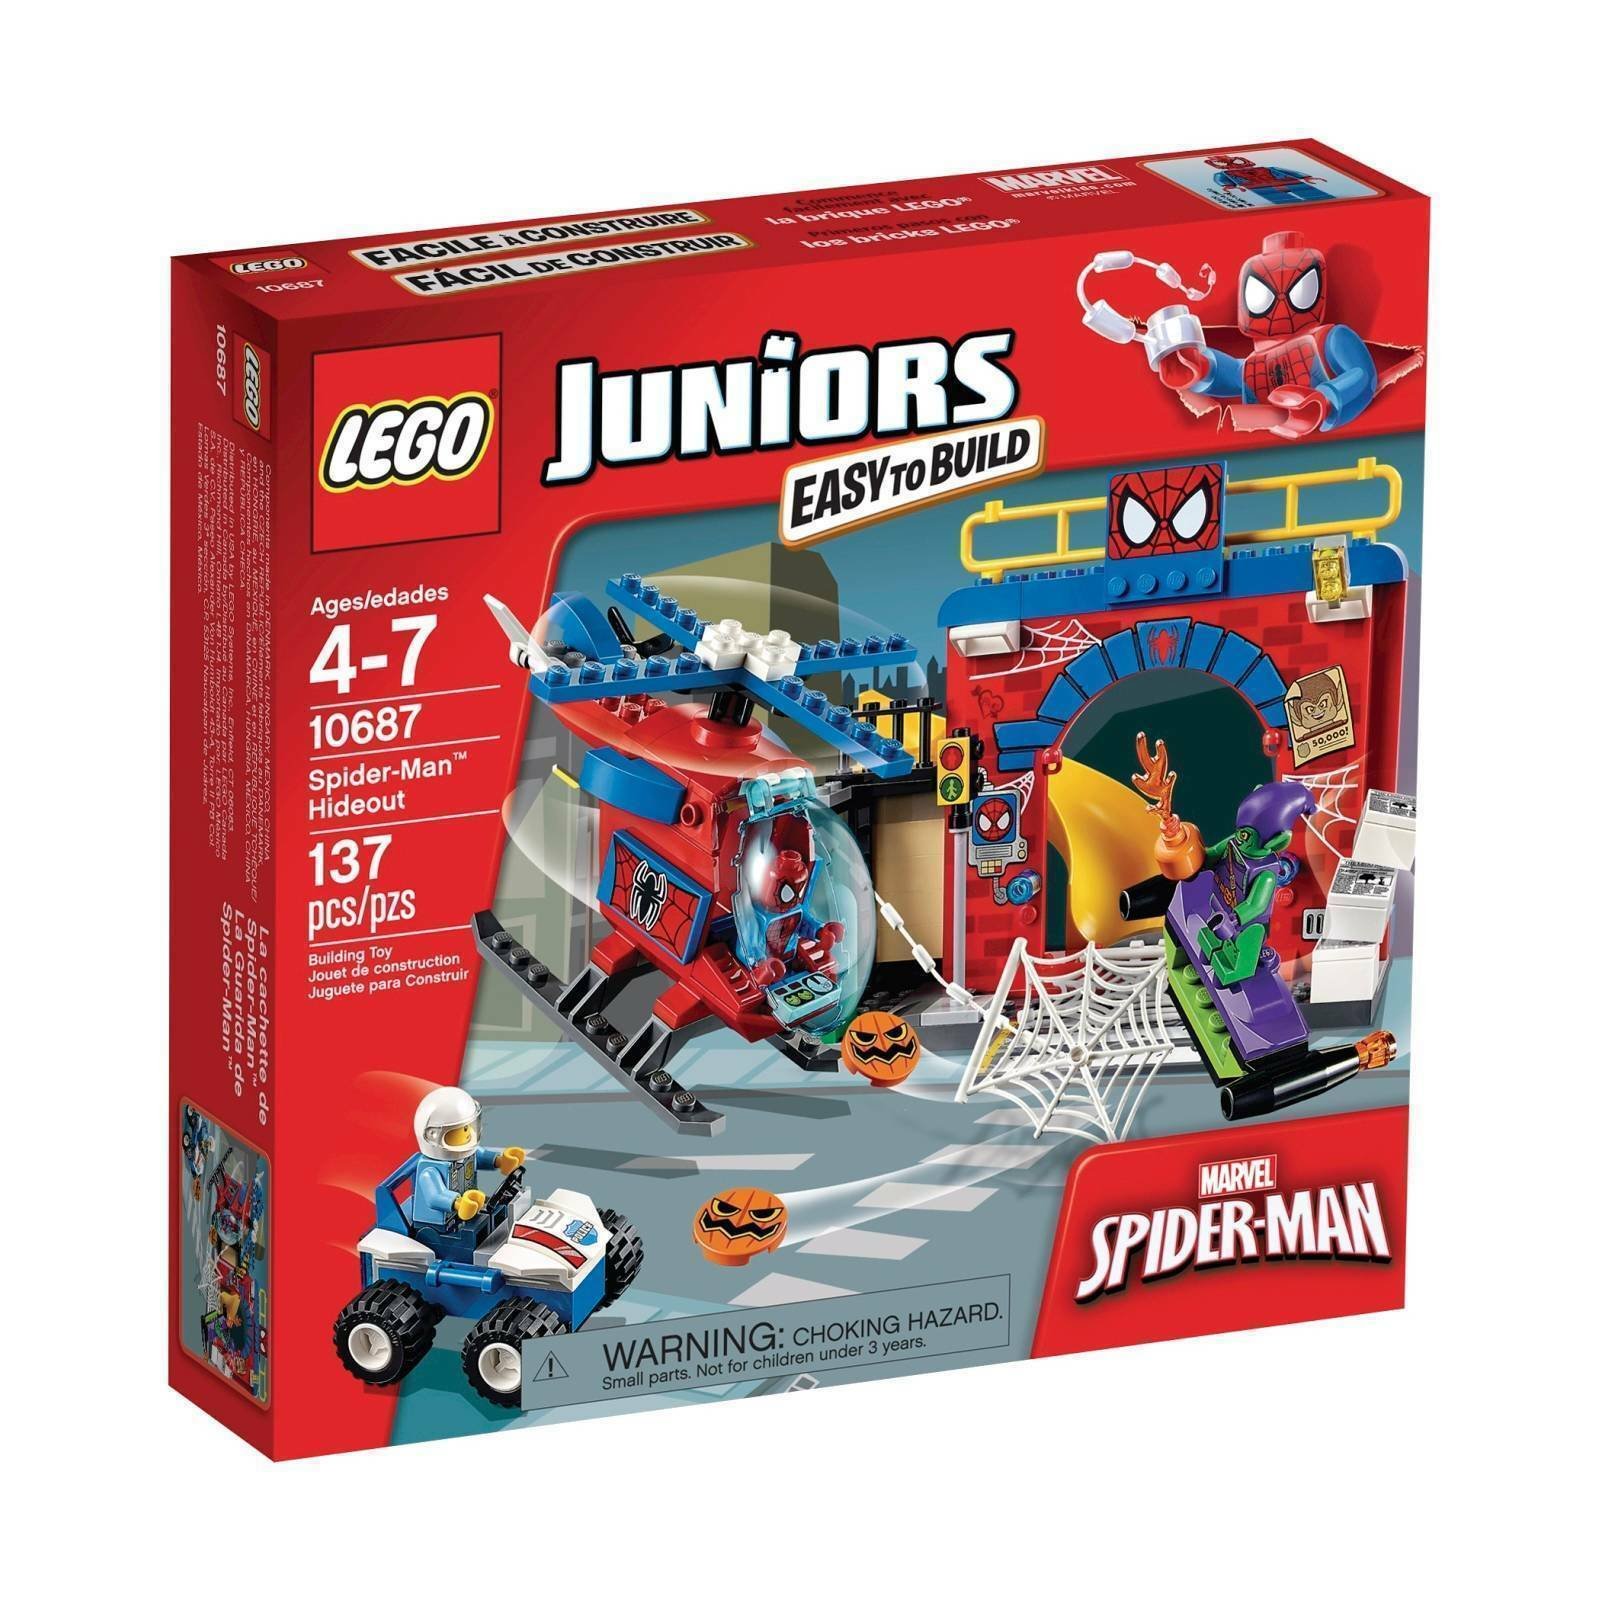 10687 SPIDER-MAN HIDEOUT lego legos set NEW juniors green goblin sealed